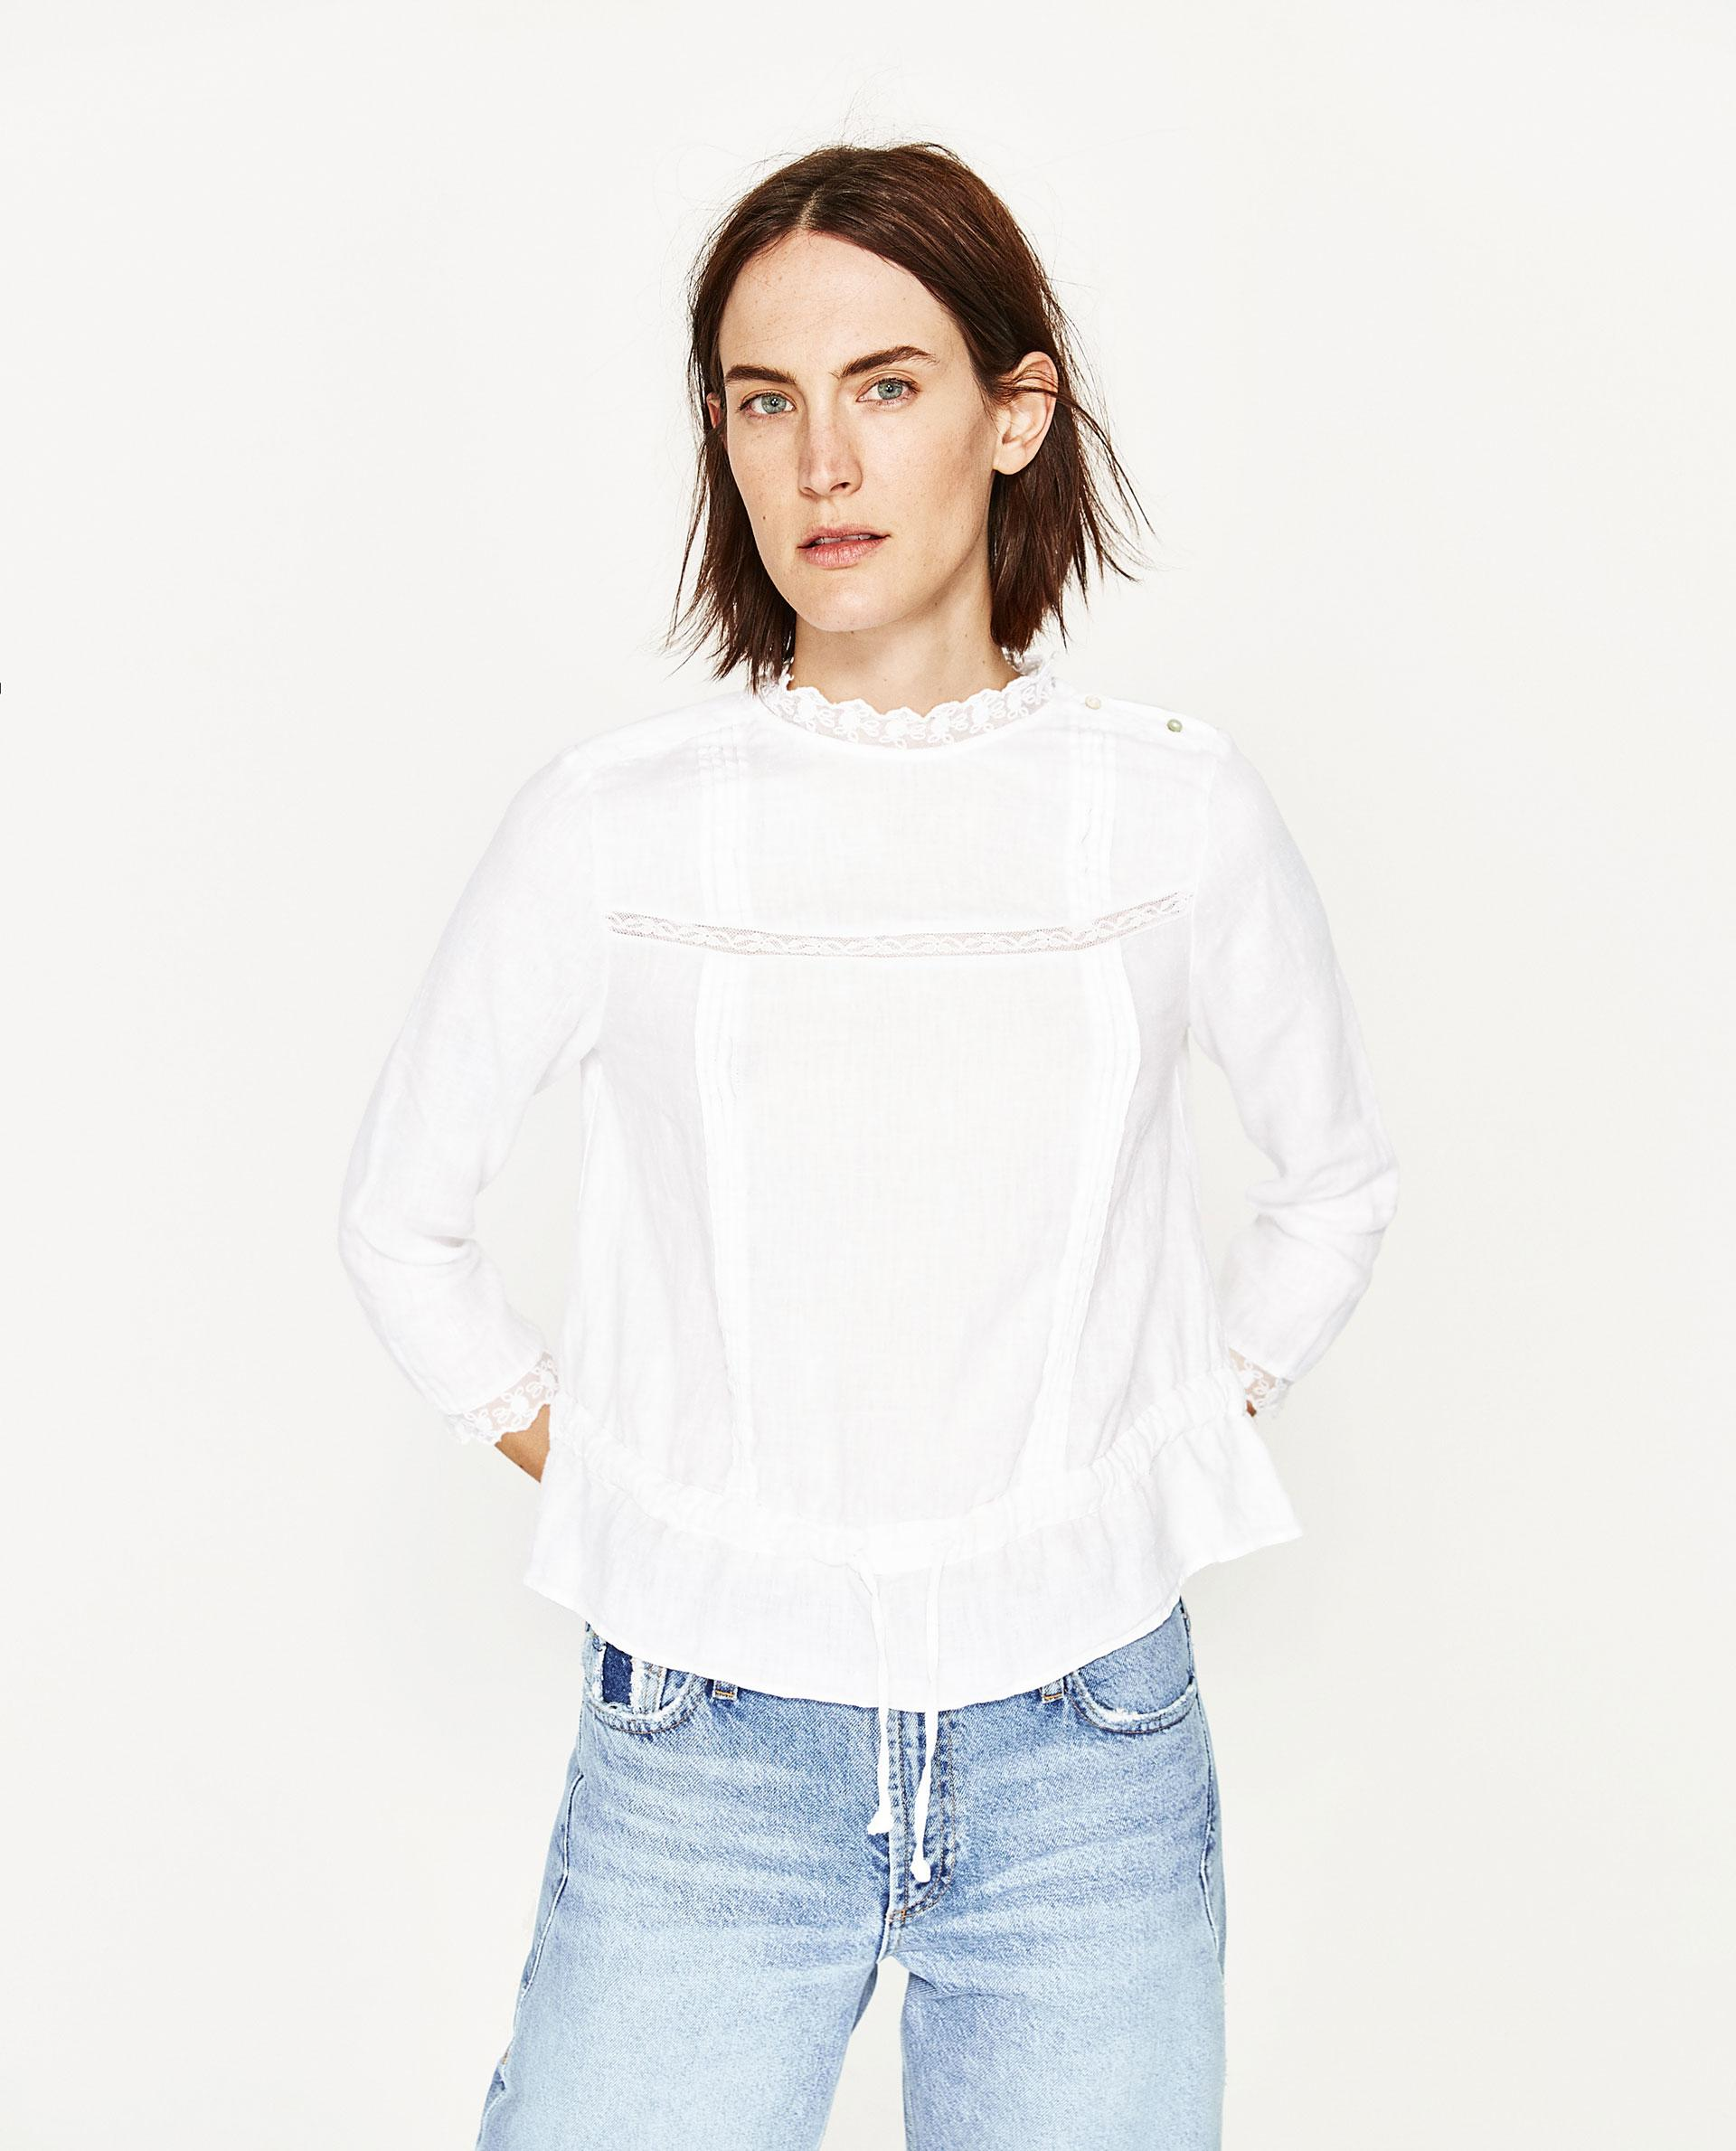 Zara Linen Blouse 13